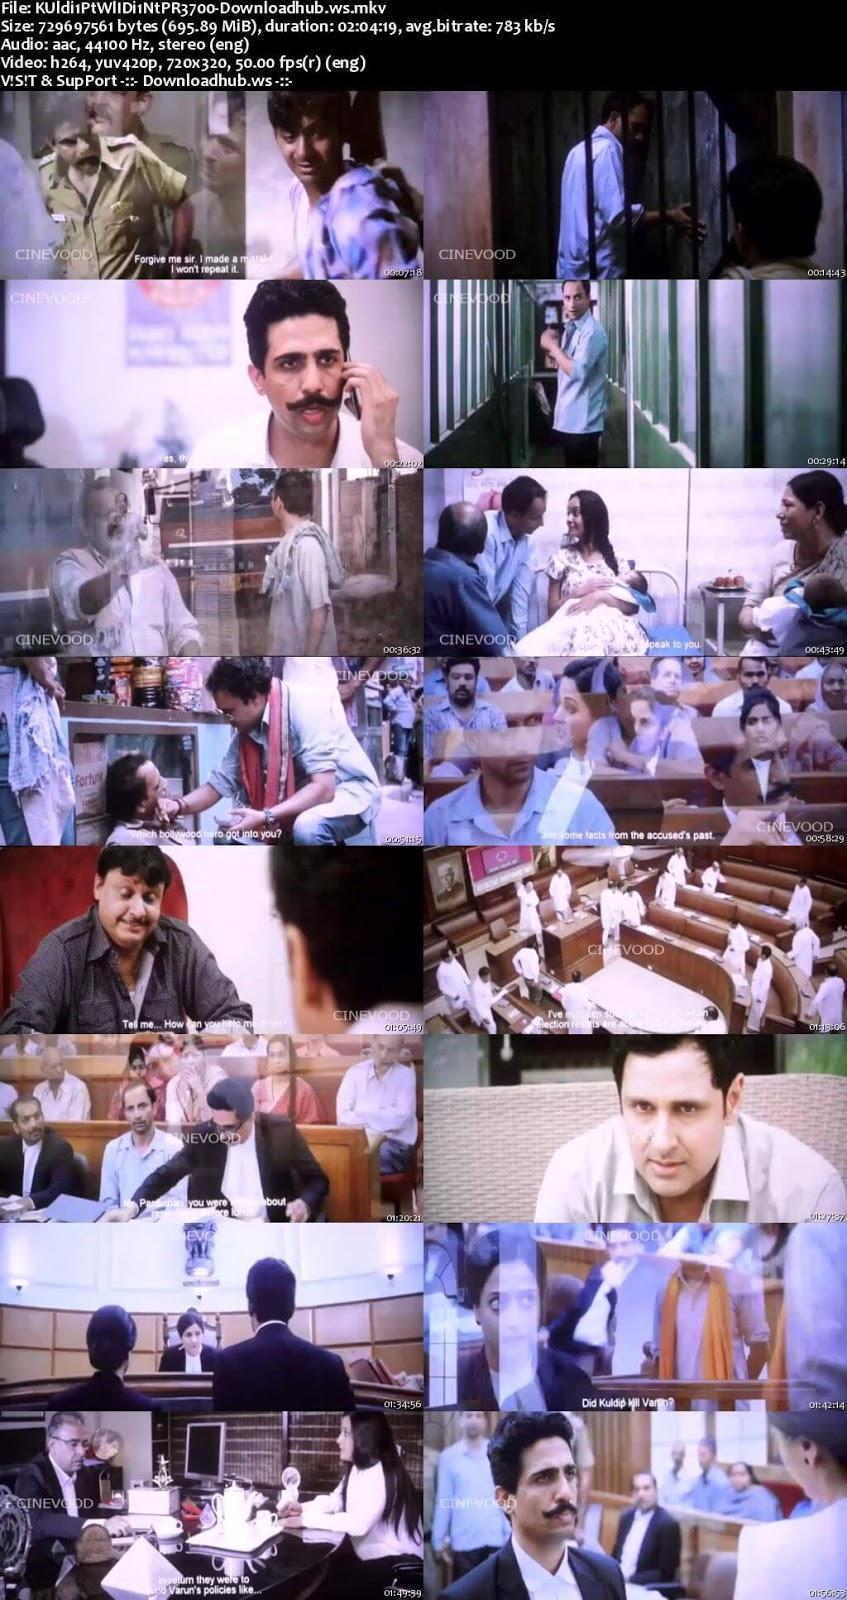 Kuldip Patwal: I Didnt Do It! 2018 Hindi DVDSCR 350MB 700MB